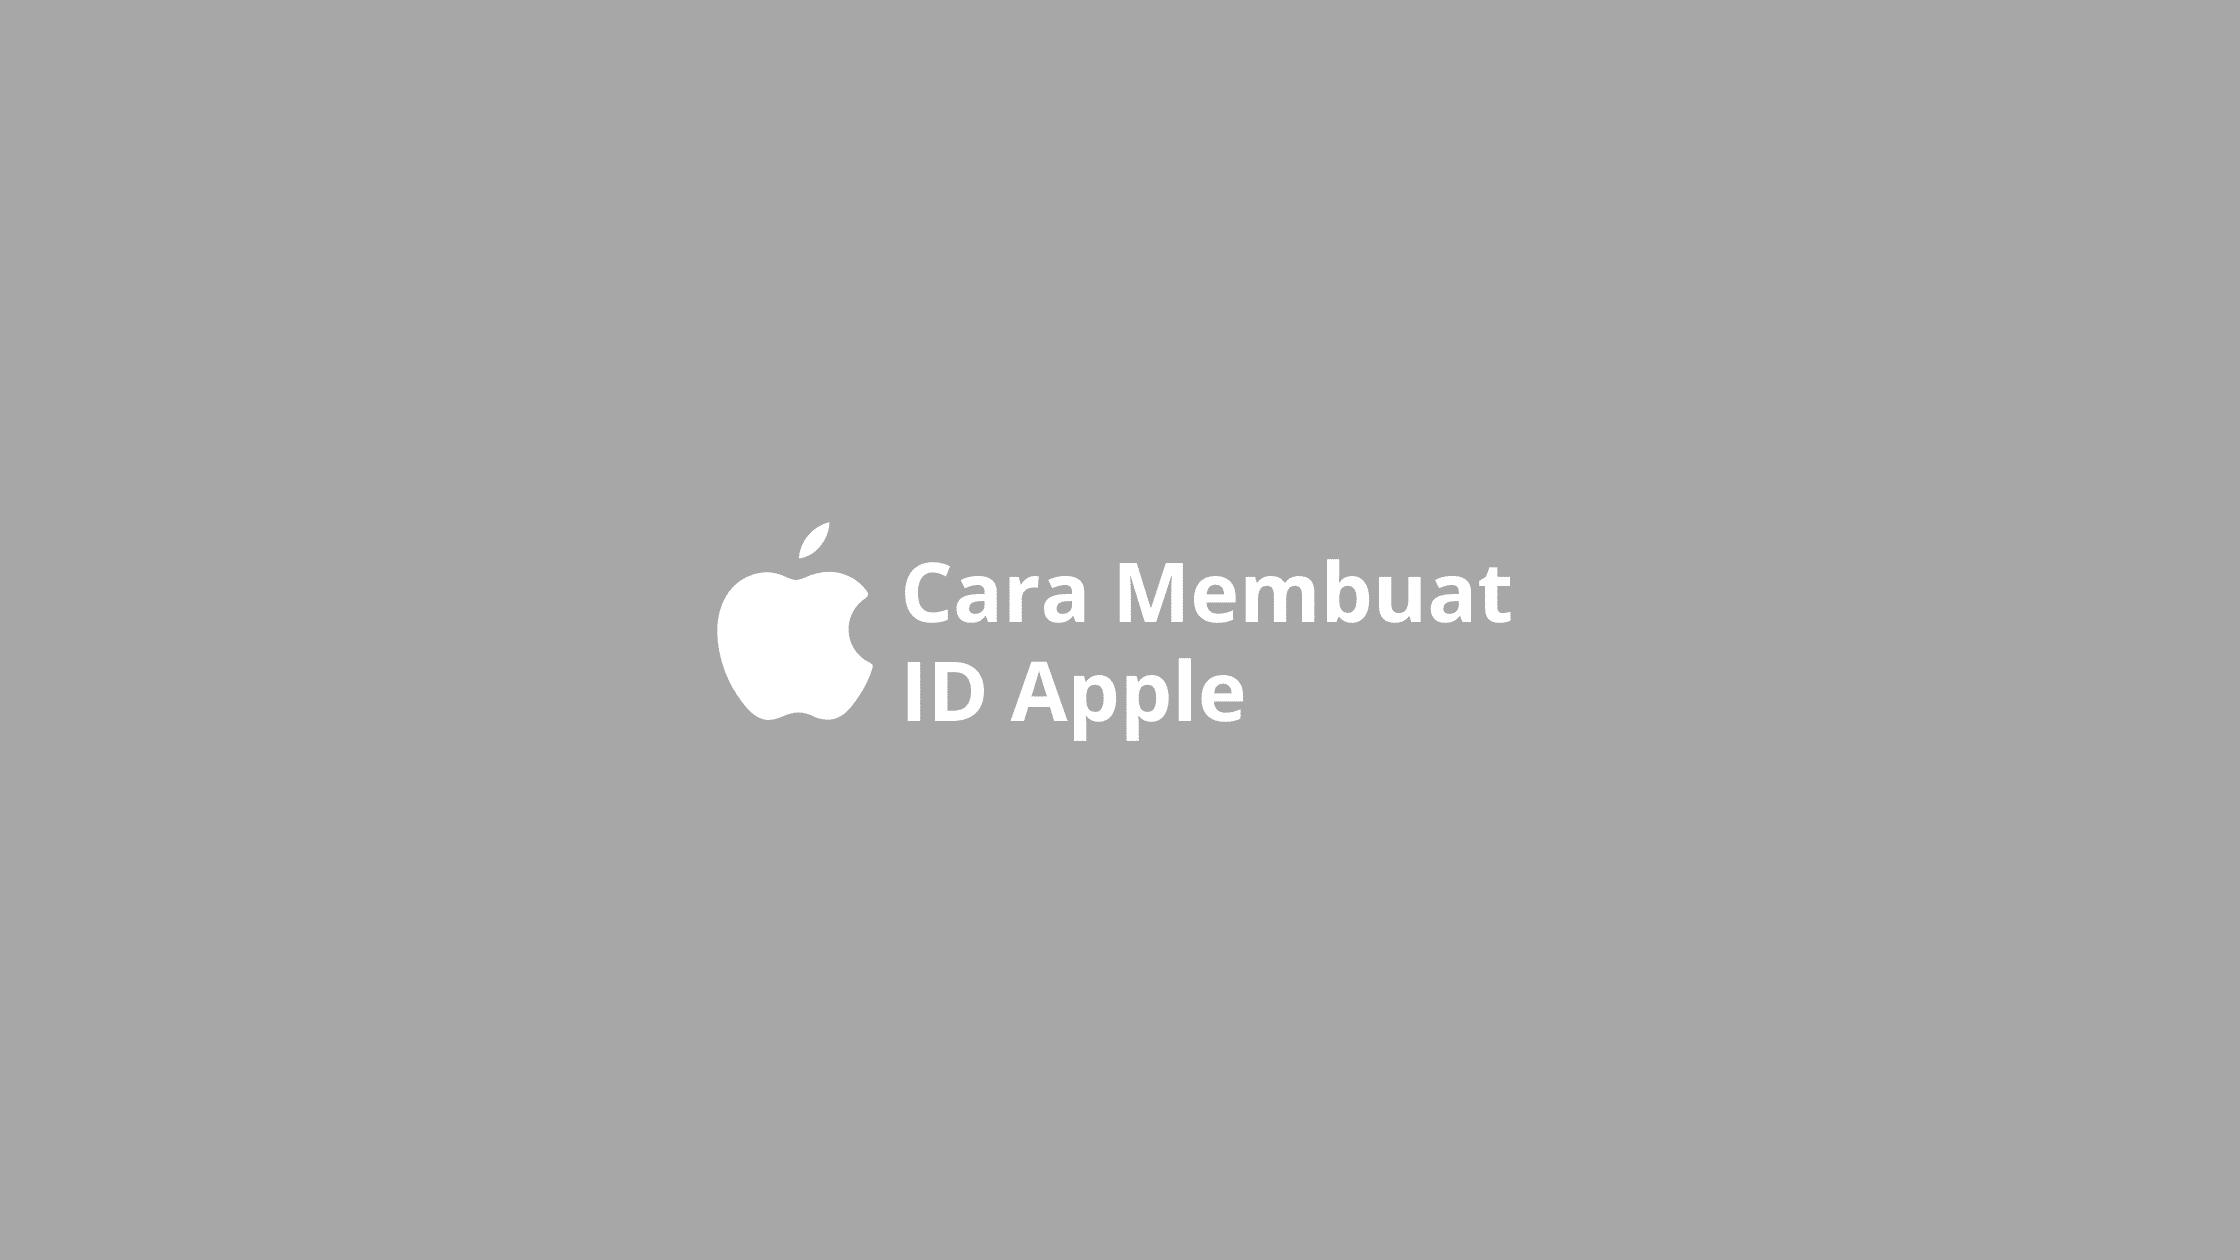 cara membuat id apple